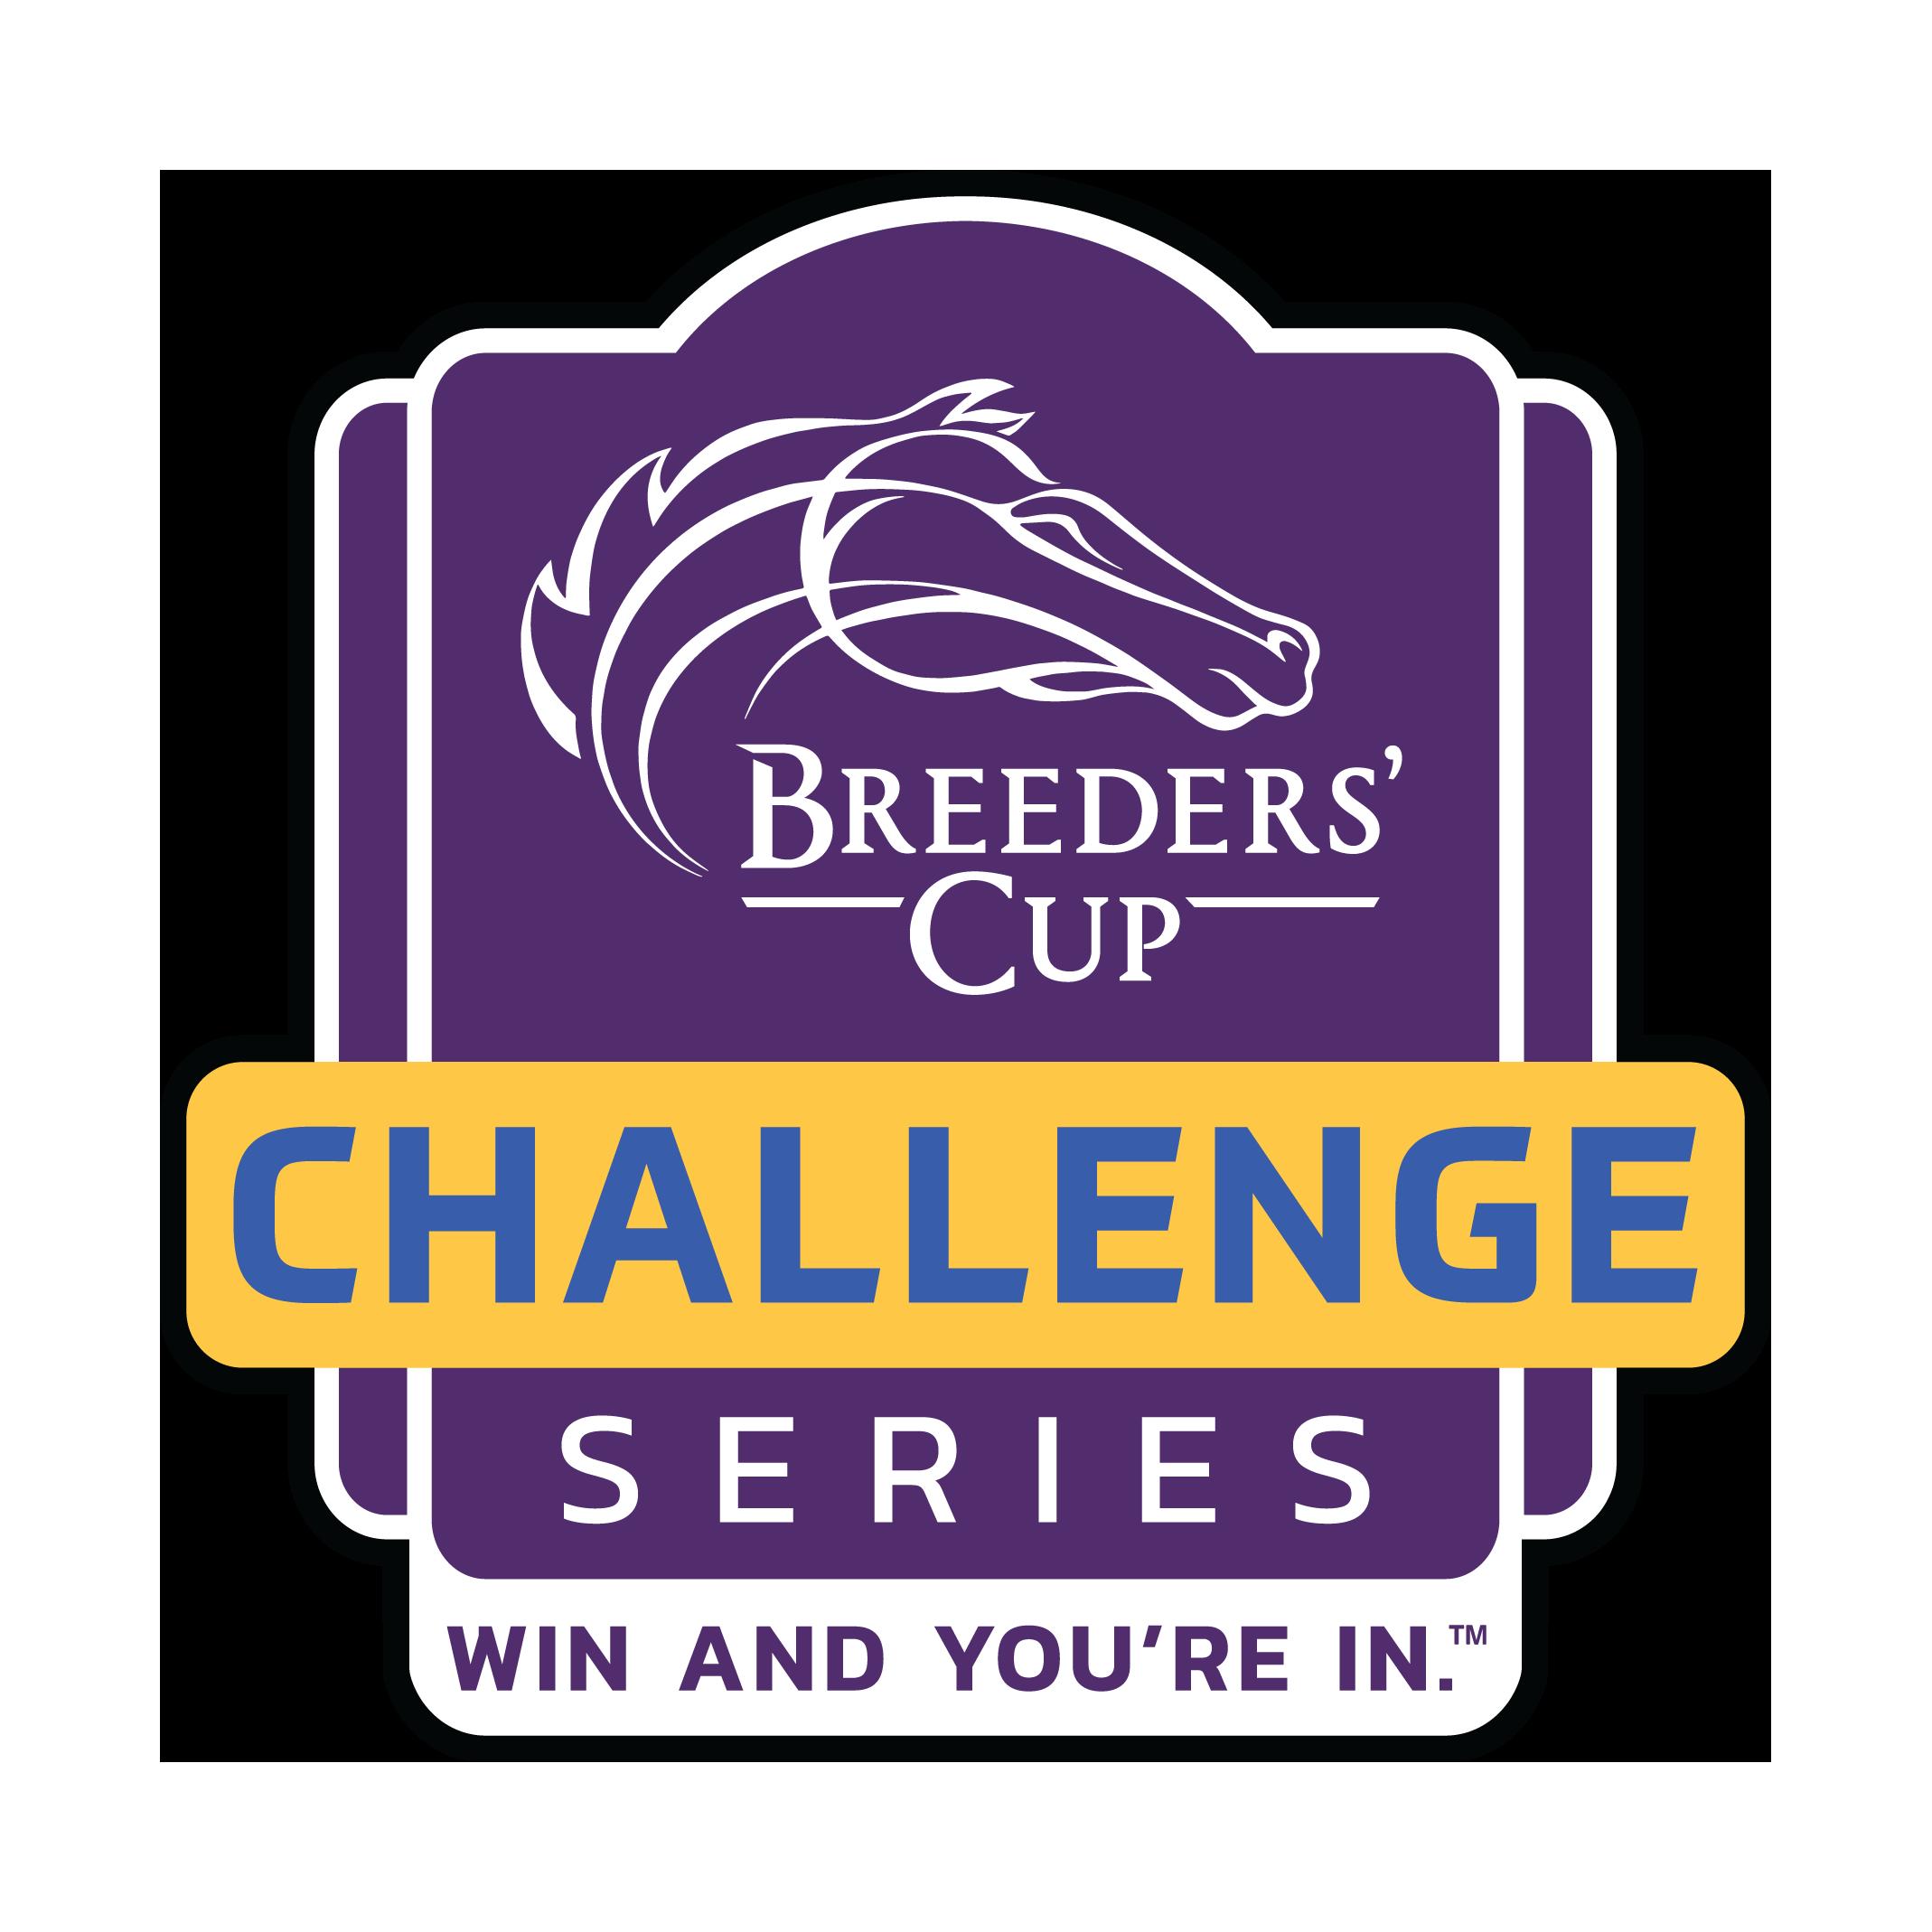 Breeders' Cup Challenge Series Logo